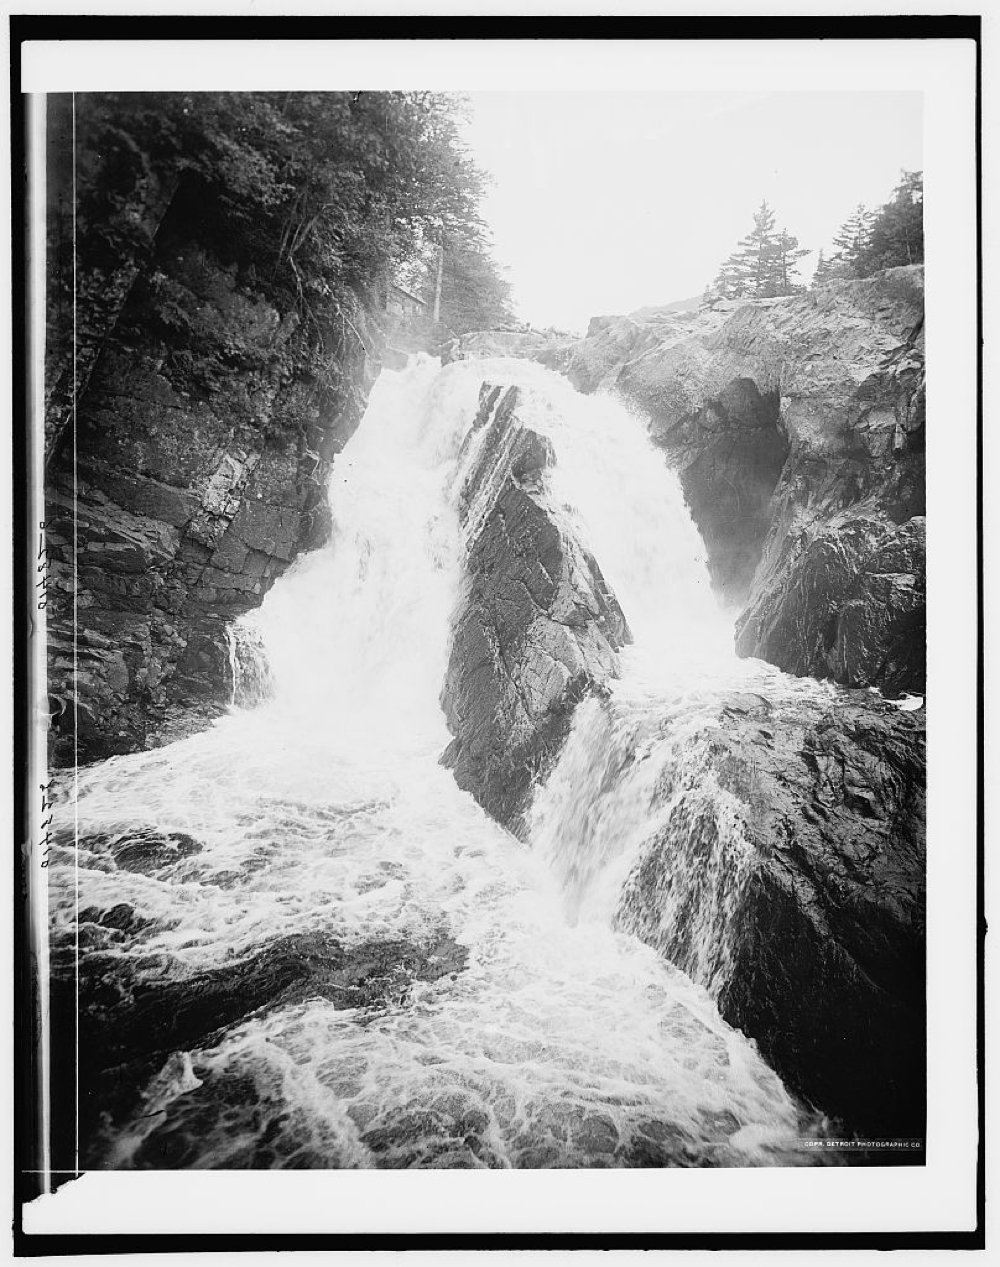 Wilmington High Fall, upper falls, Adirondack Mountains